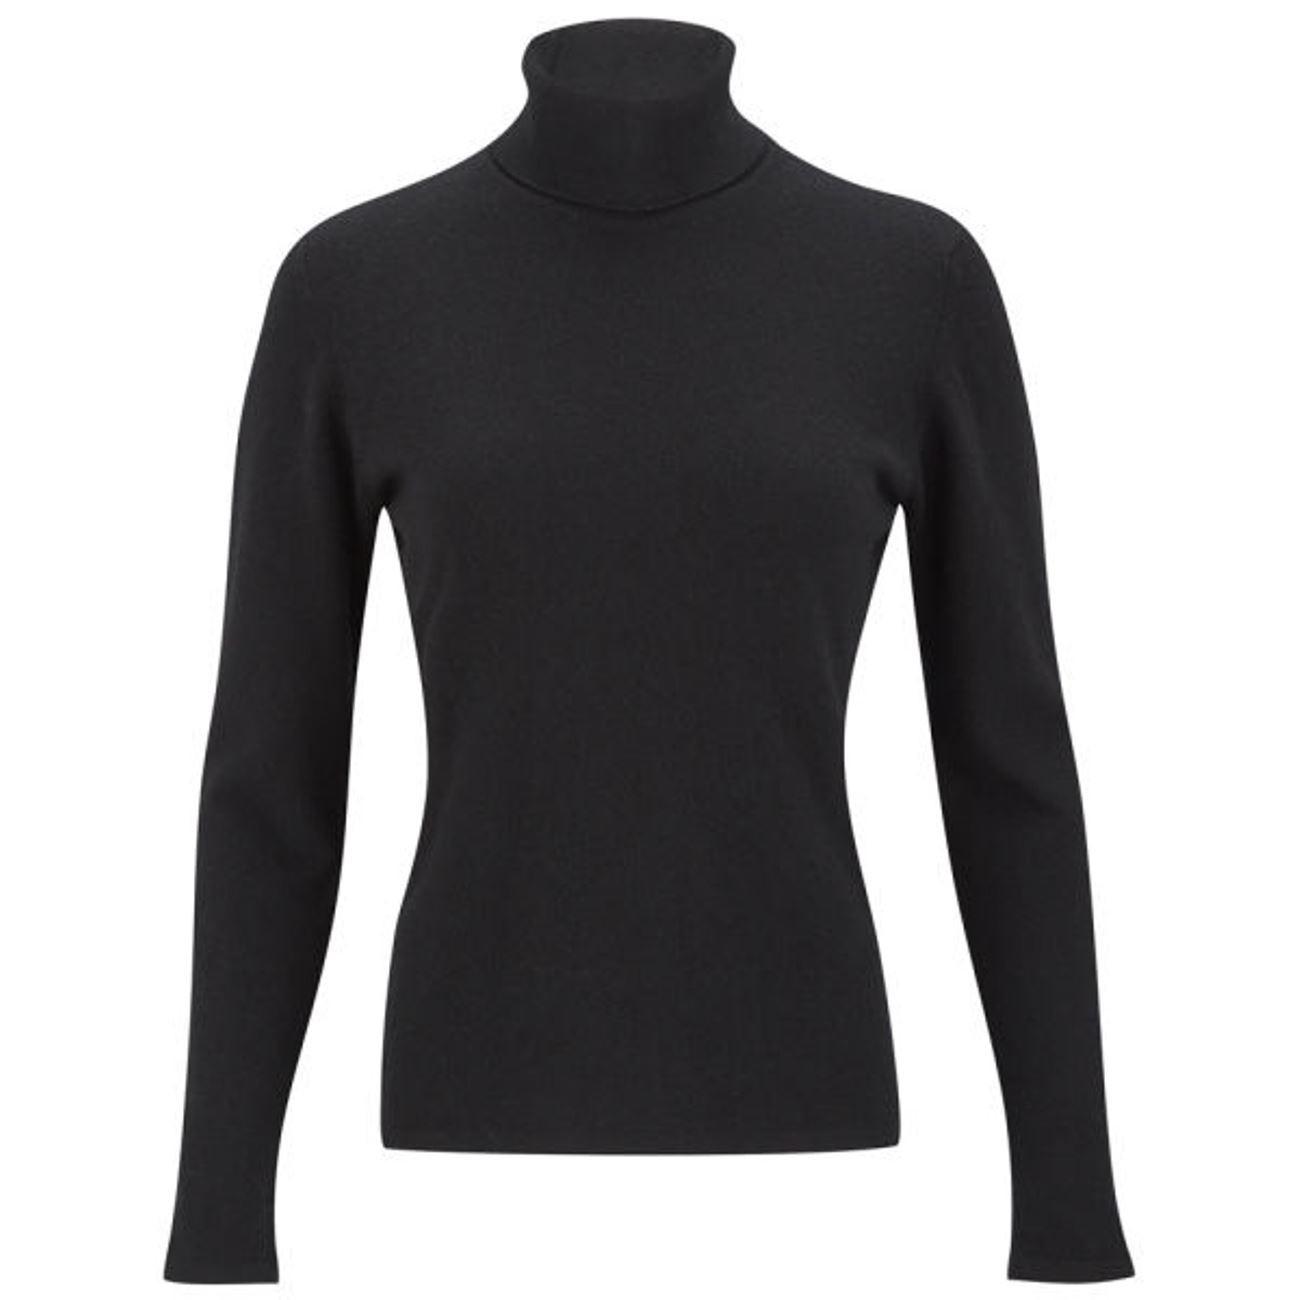 Black Ladies' Roll Neck - 100% Cashmere Made in Scotland